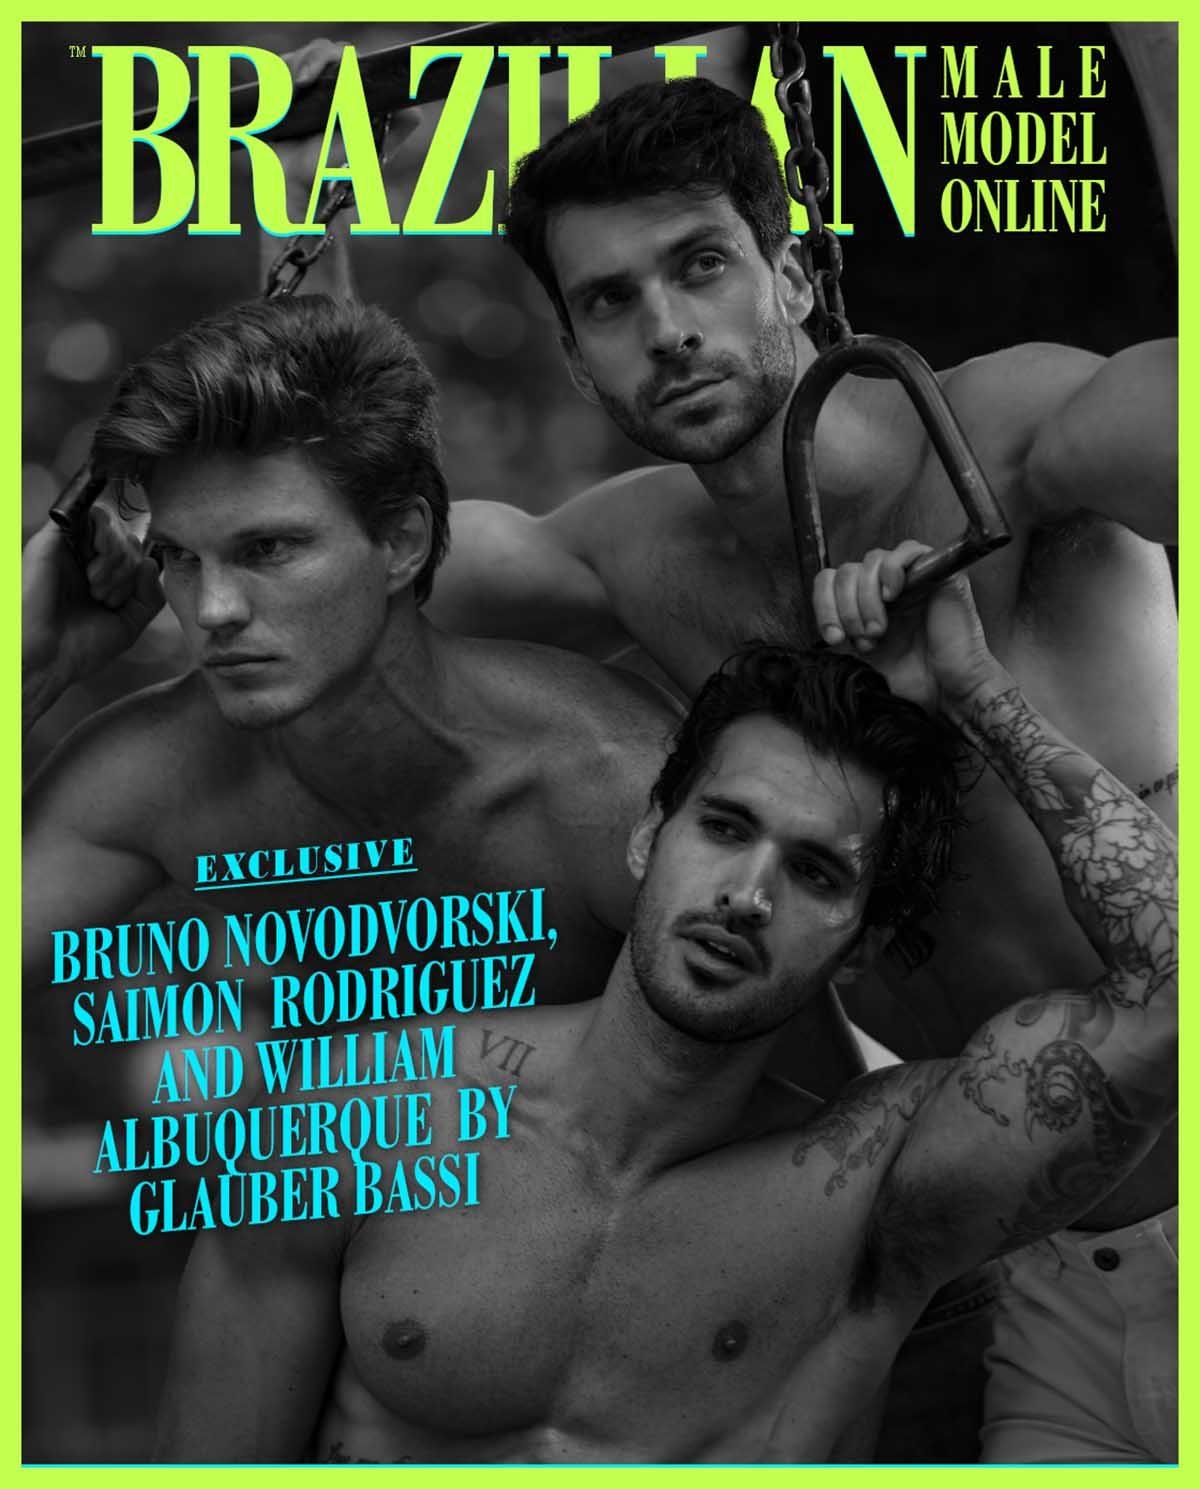 Bruno Novodvorski, Saimon Rodriguez and William Albuquerque by Glauber Bassi